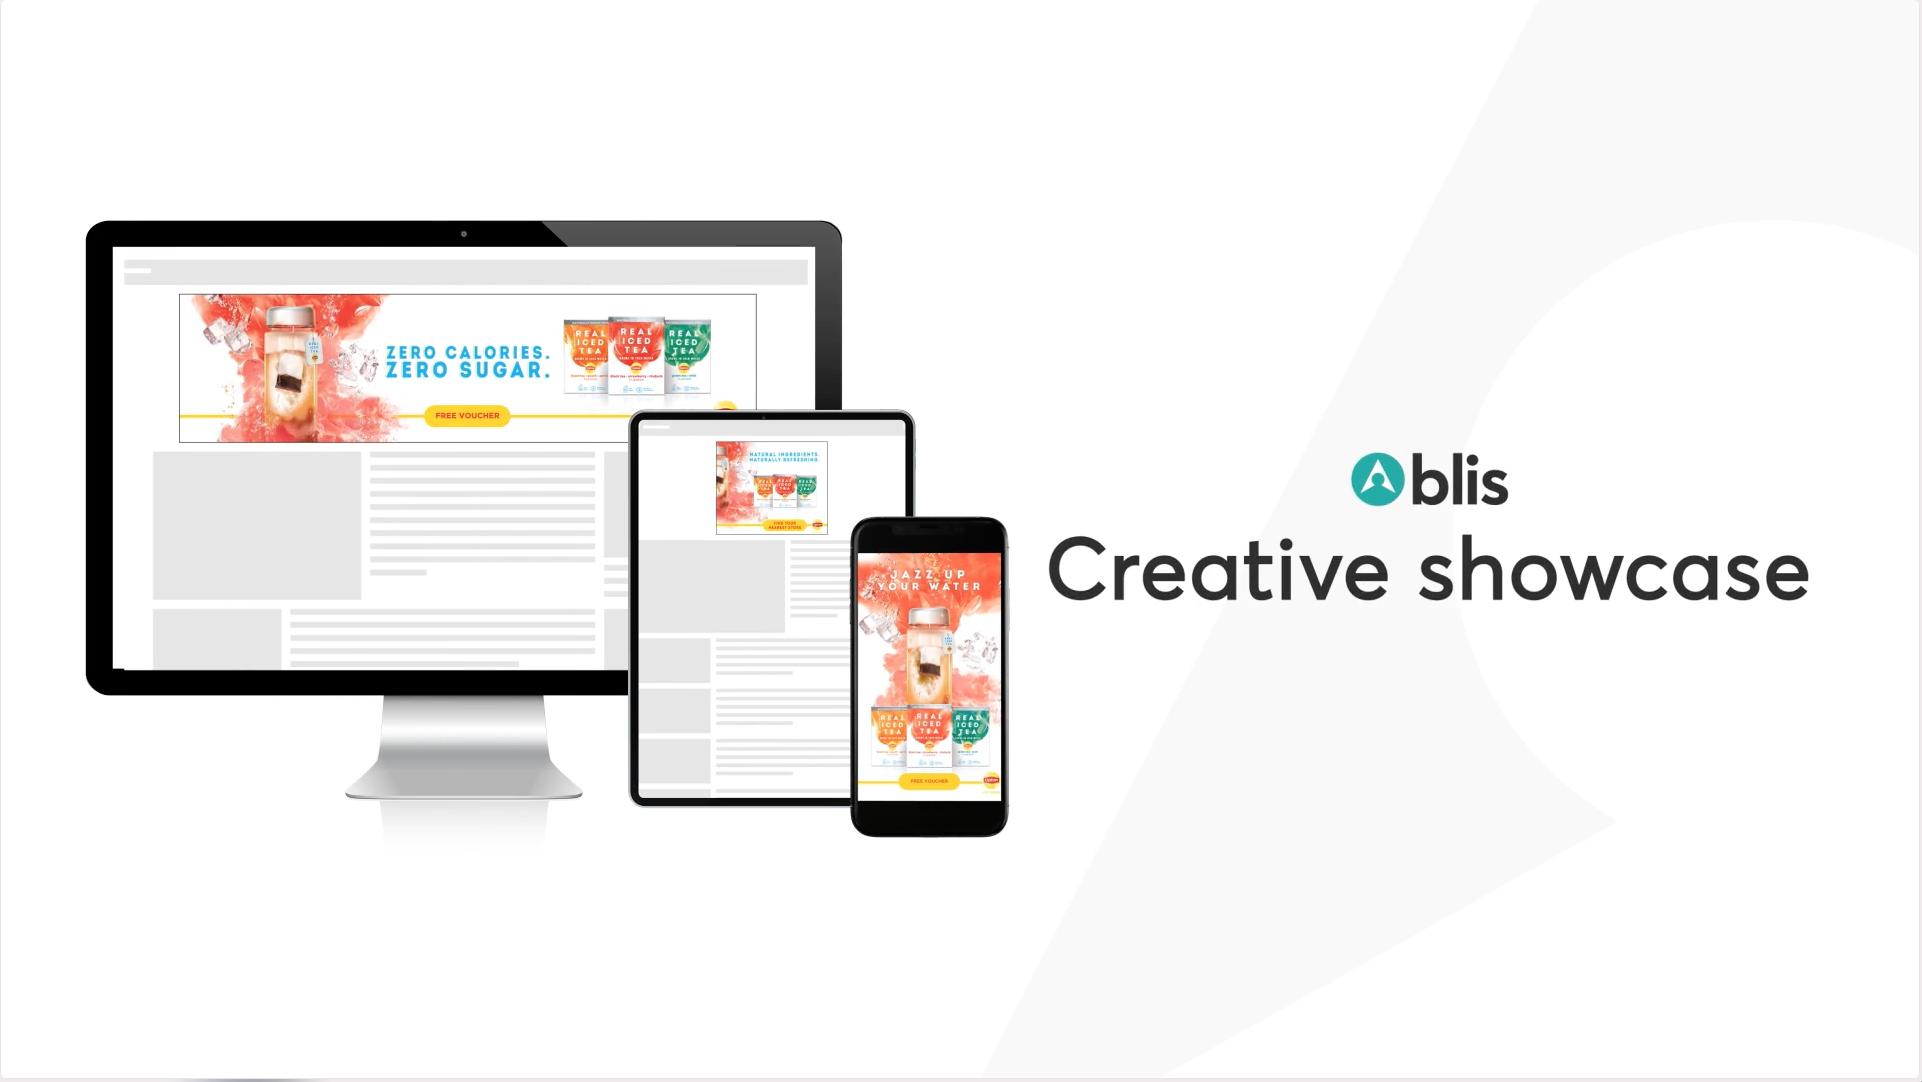 Blis – Creative showcase